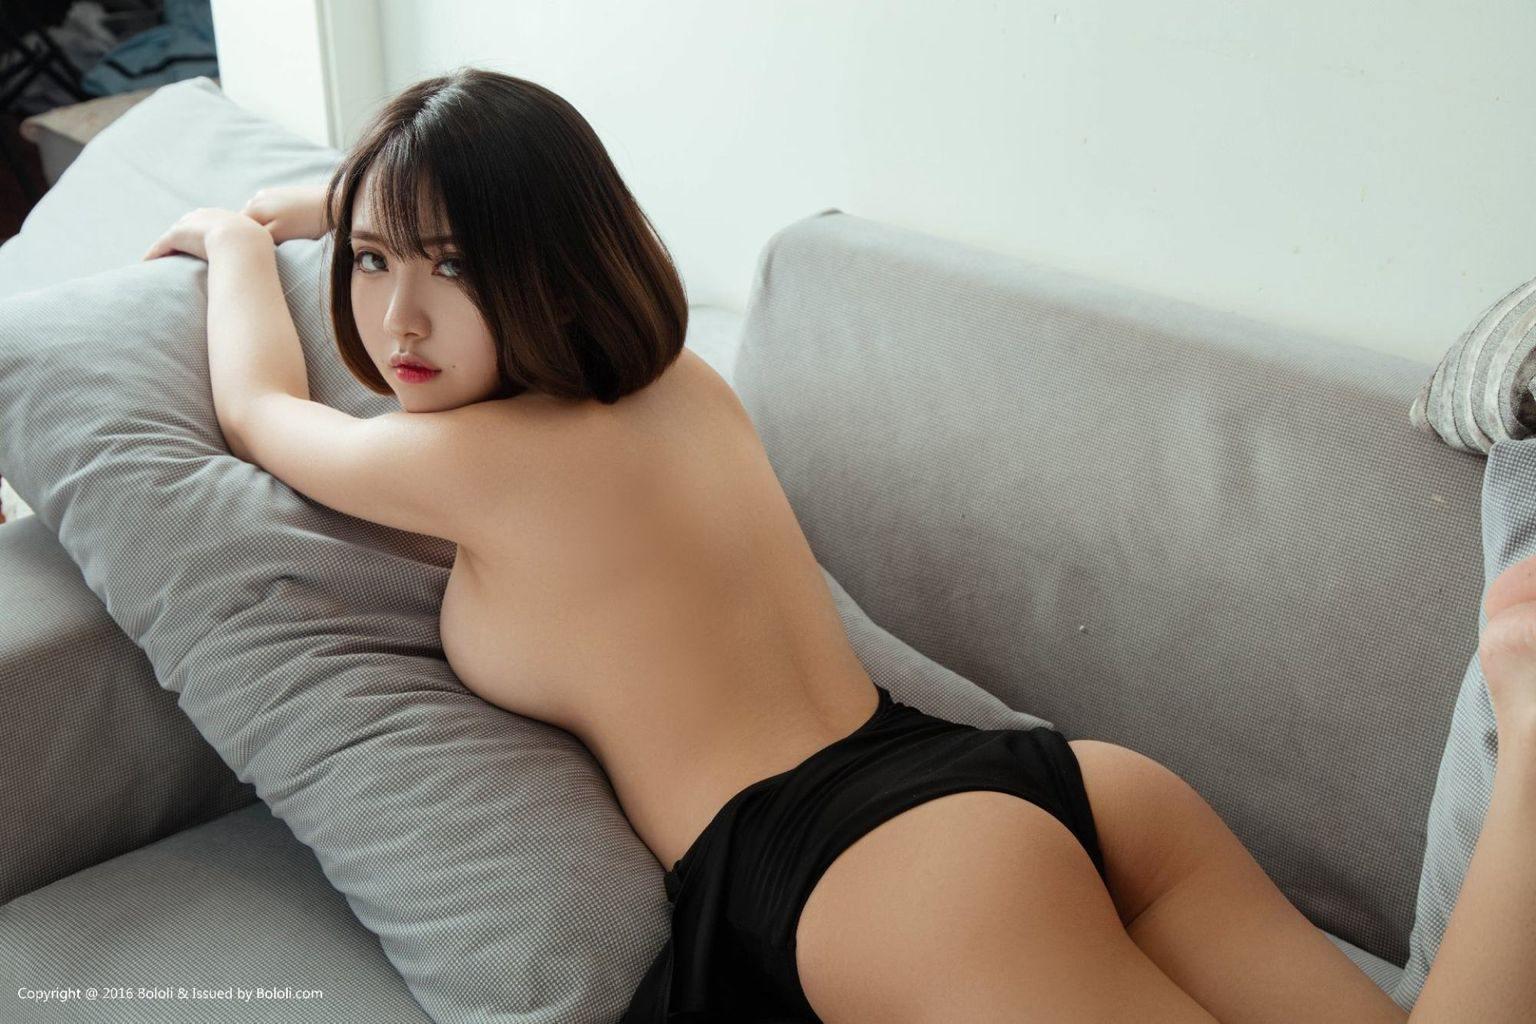 China Beautyful Girl Pic No.034    小魔女奈奈 (Xiao Mo Nu Nai Nai)